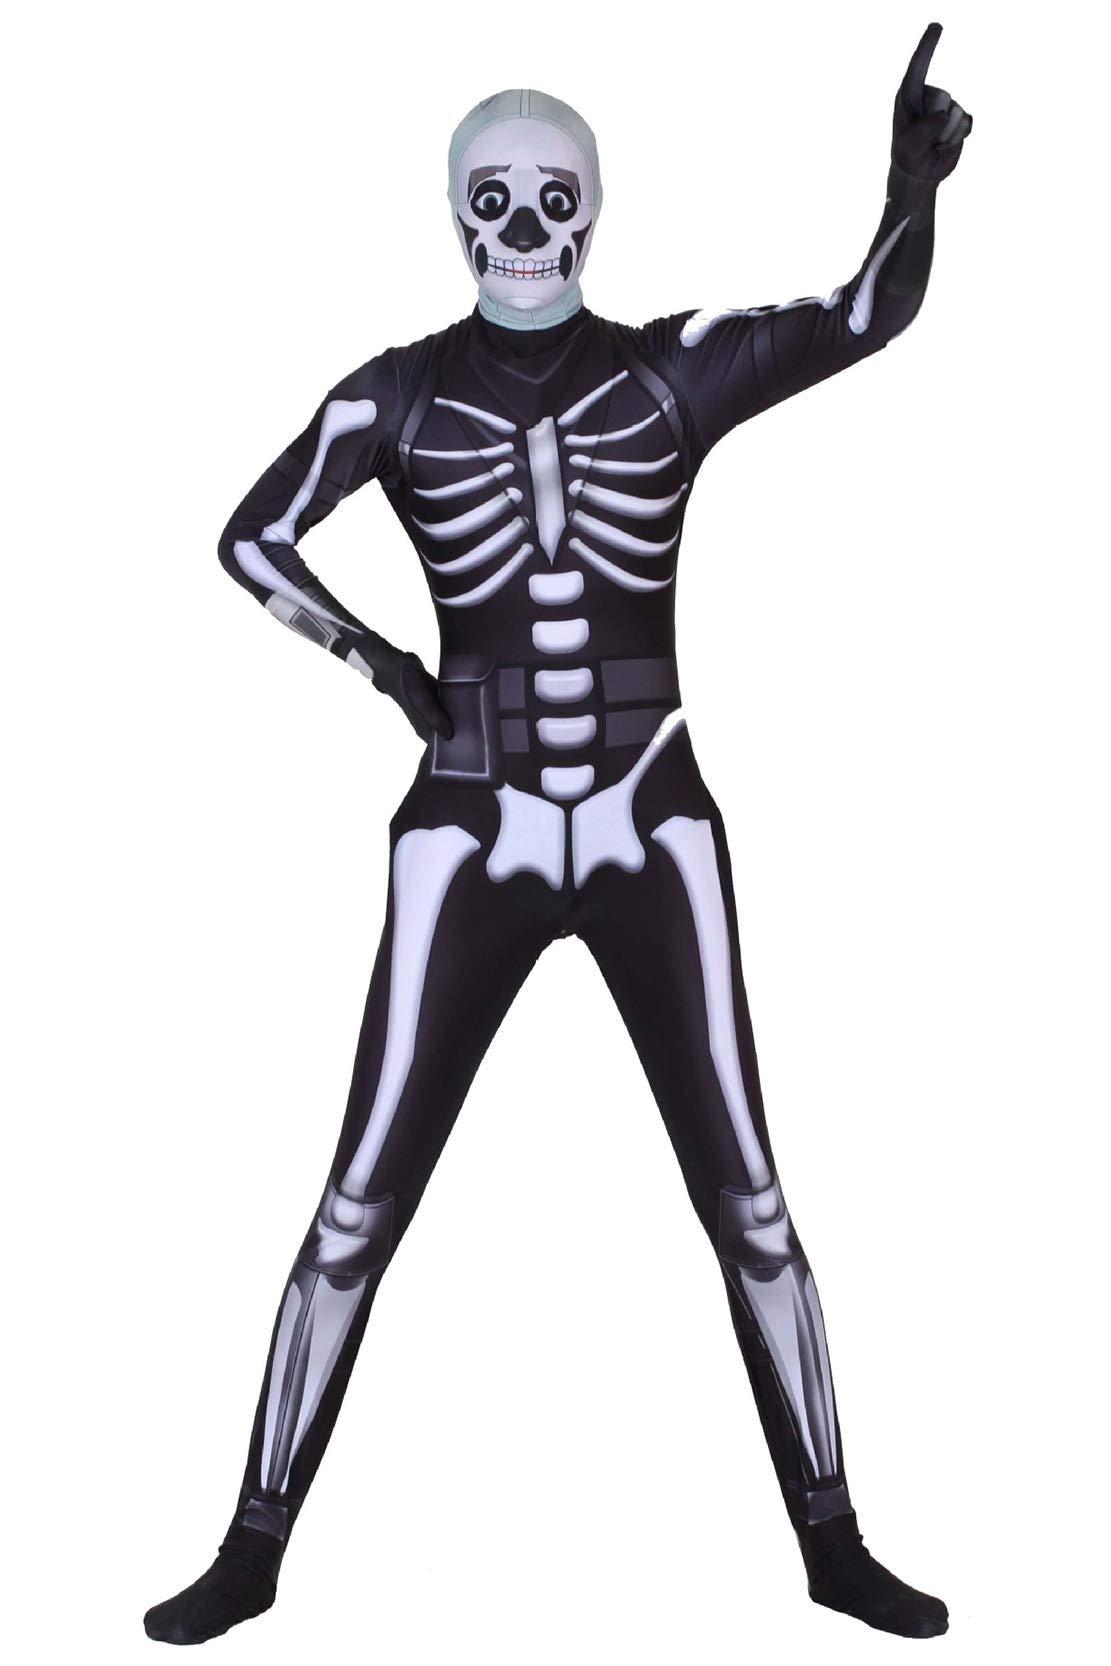 - 615JWd tL3L - Ditard Adult Kids Halloween 3D Zentai Spandex Bodysuit Cosplay Skull Costume